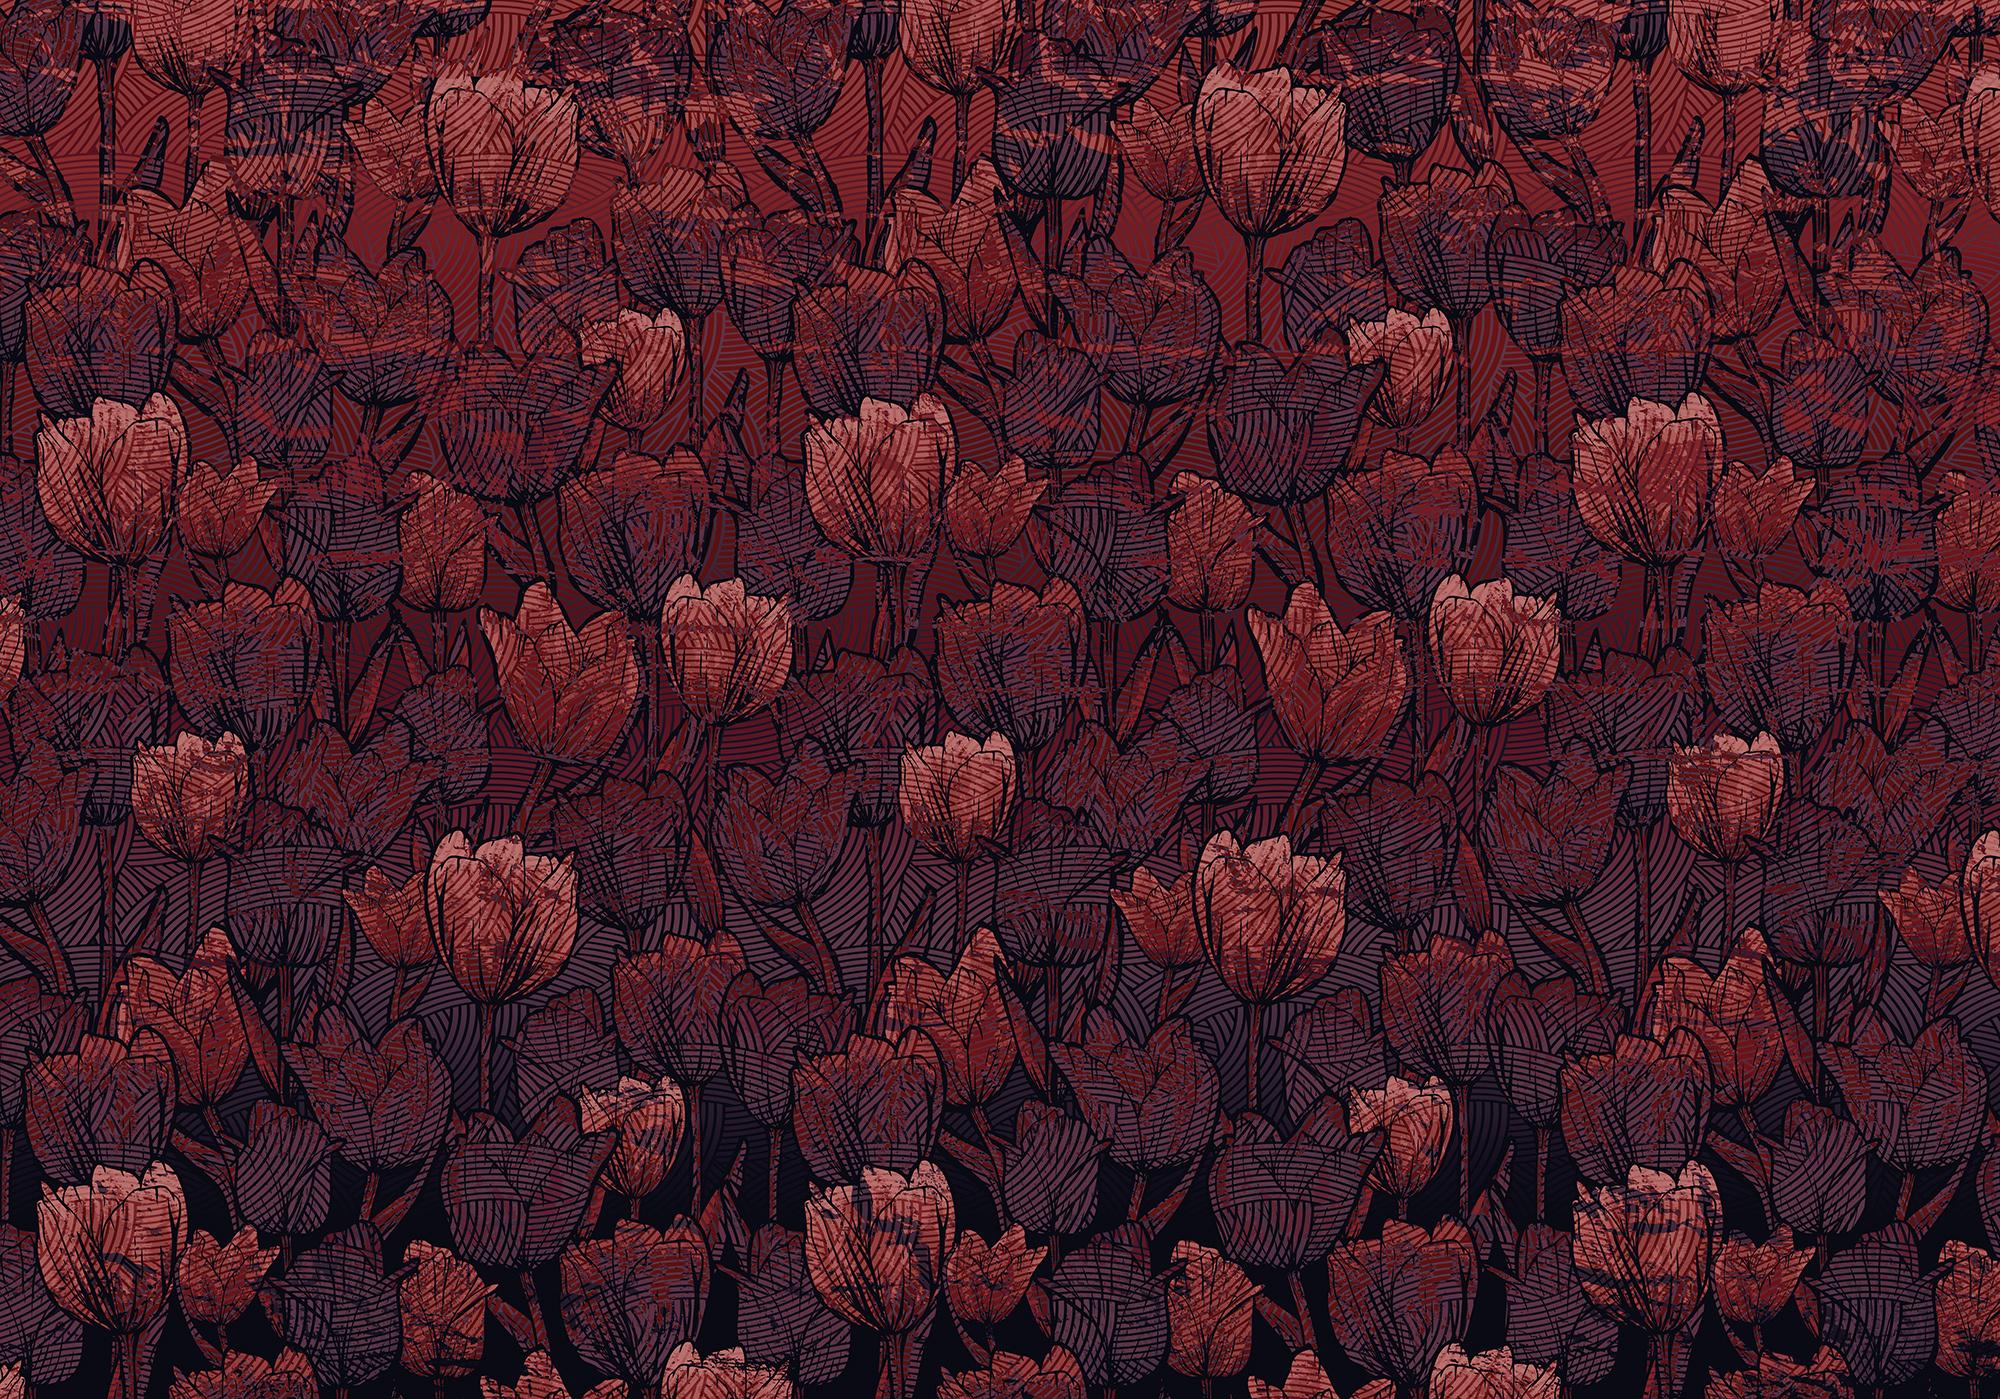 Heritage Edition 1 Fotobehang Komar - Bloemen behang TULIPE